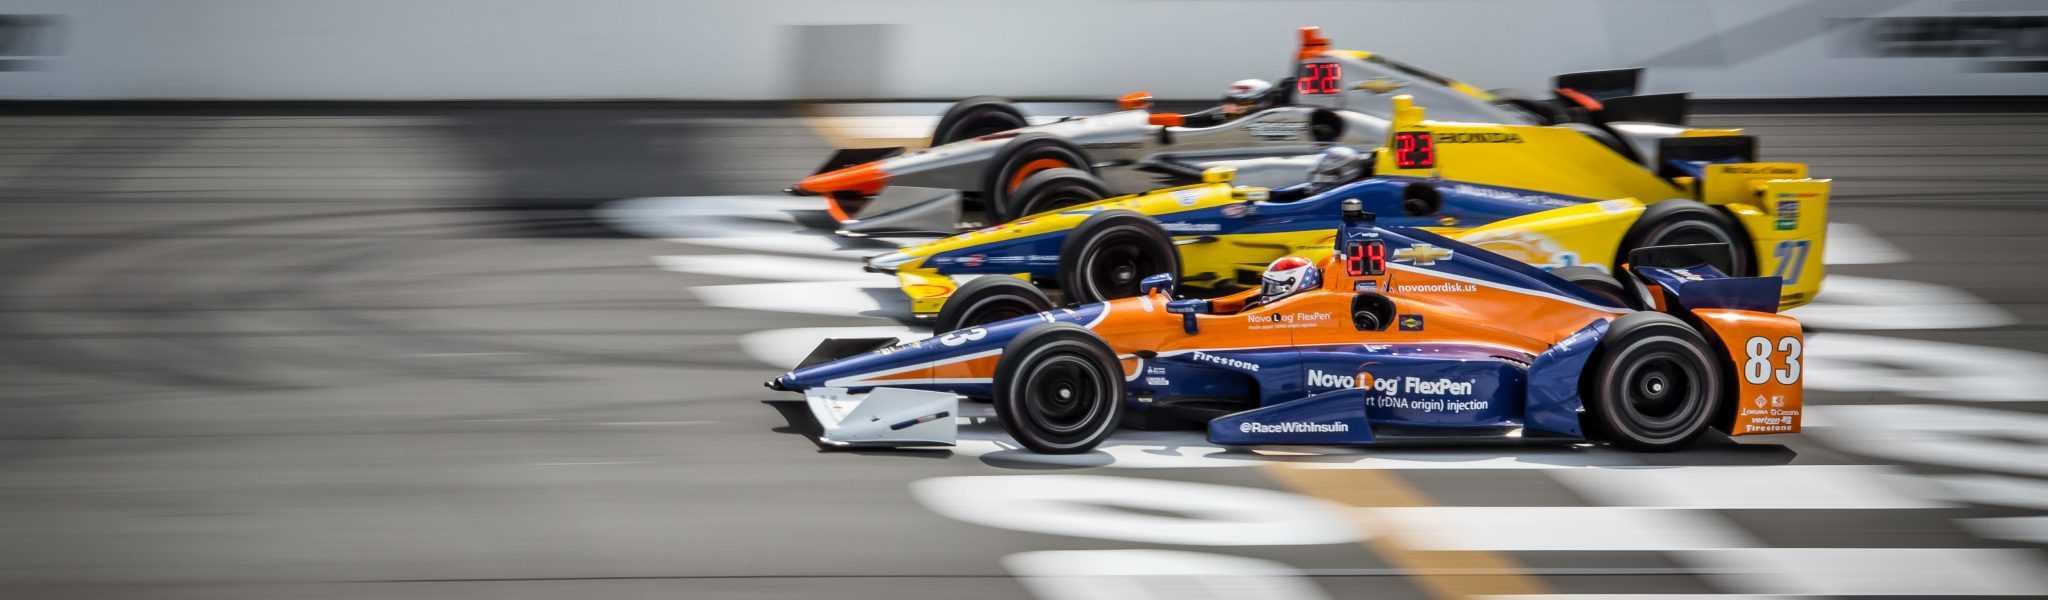 ABC Supply 500 Indycar race at Pocono Raceway